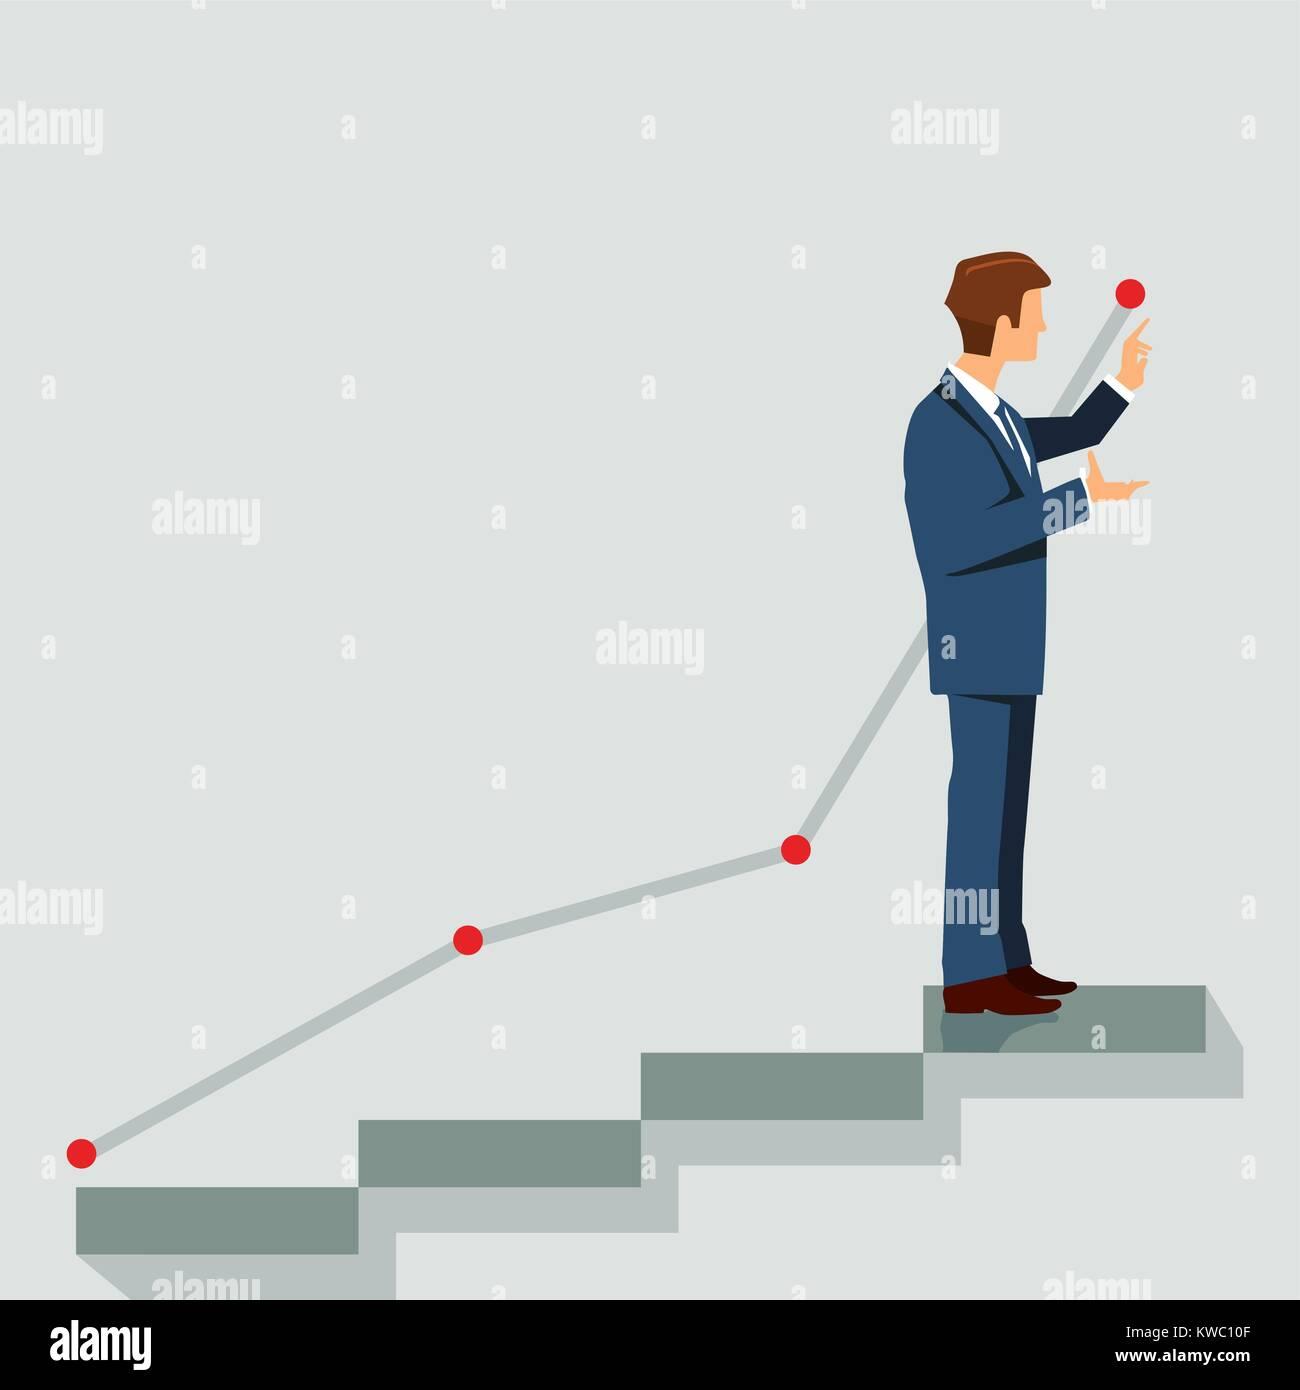 Career plan, symbol illustration - Stock Vector